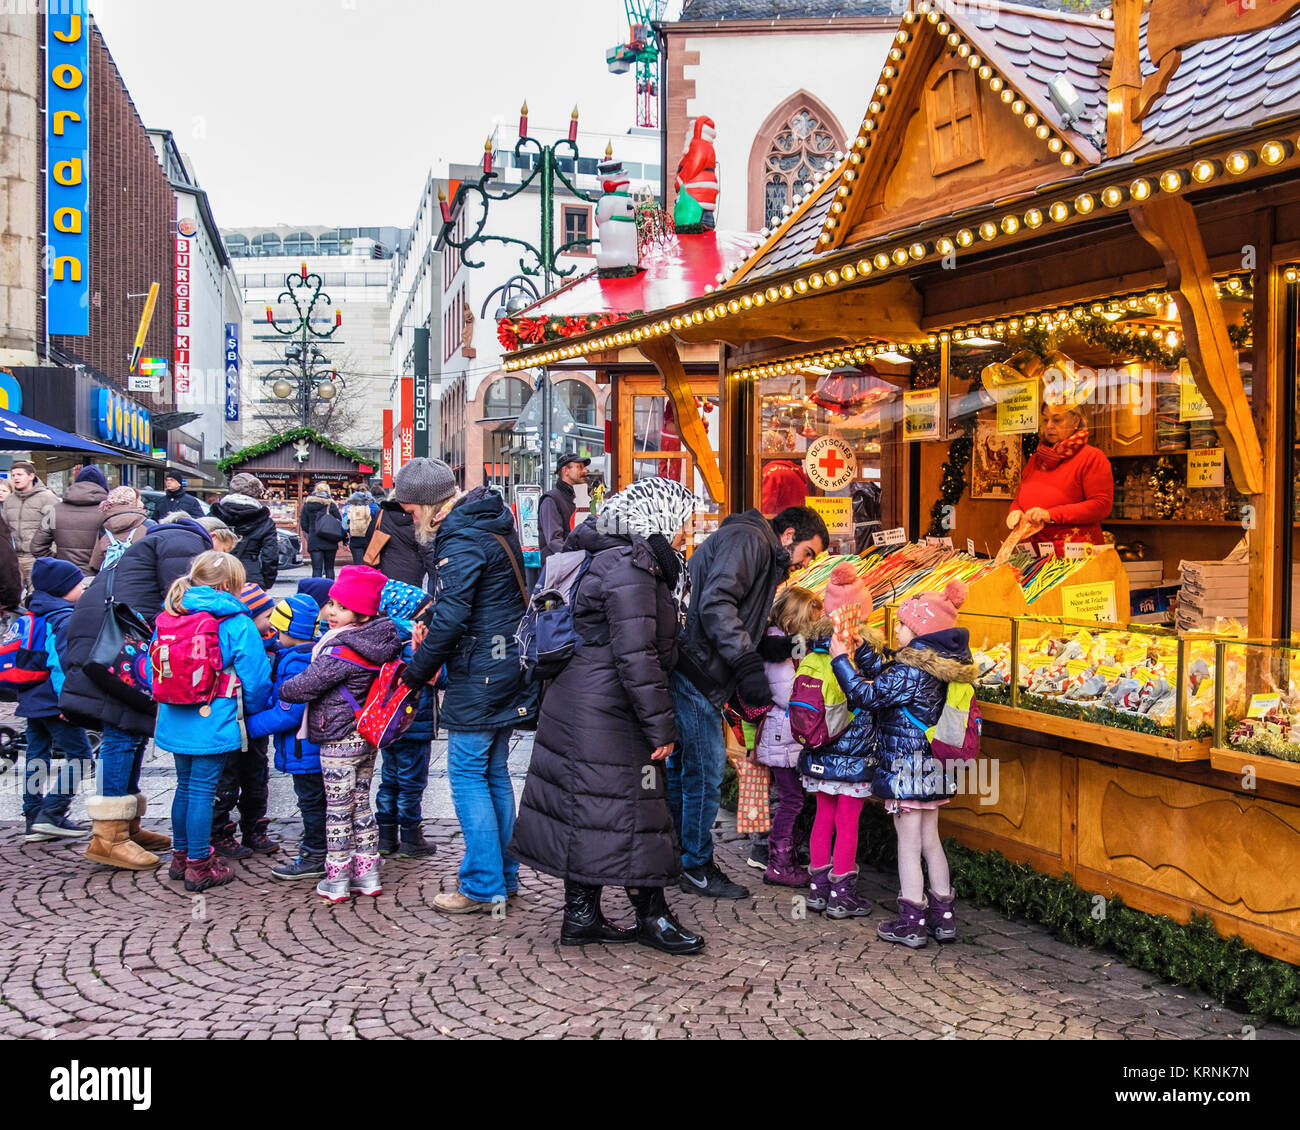 Frankfurt,Germany.Liebfrauenberg. Children shopping at Traditional German Christmas market stall. - Stock Image